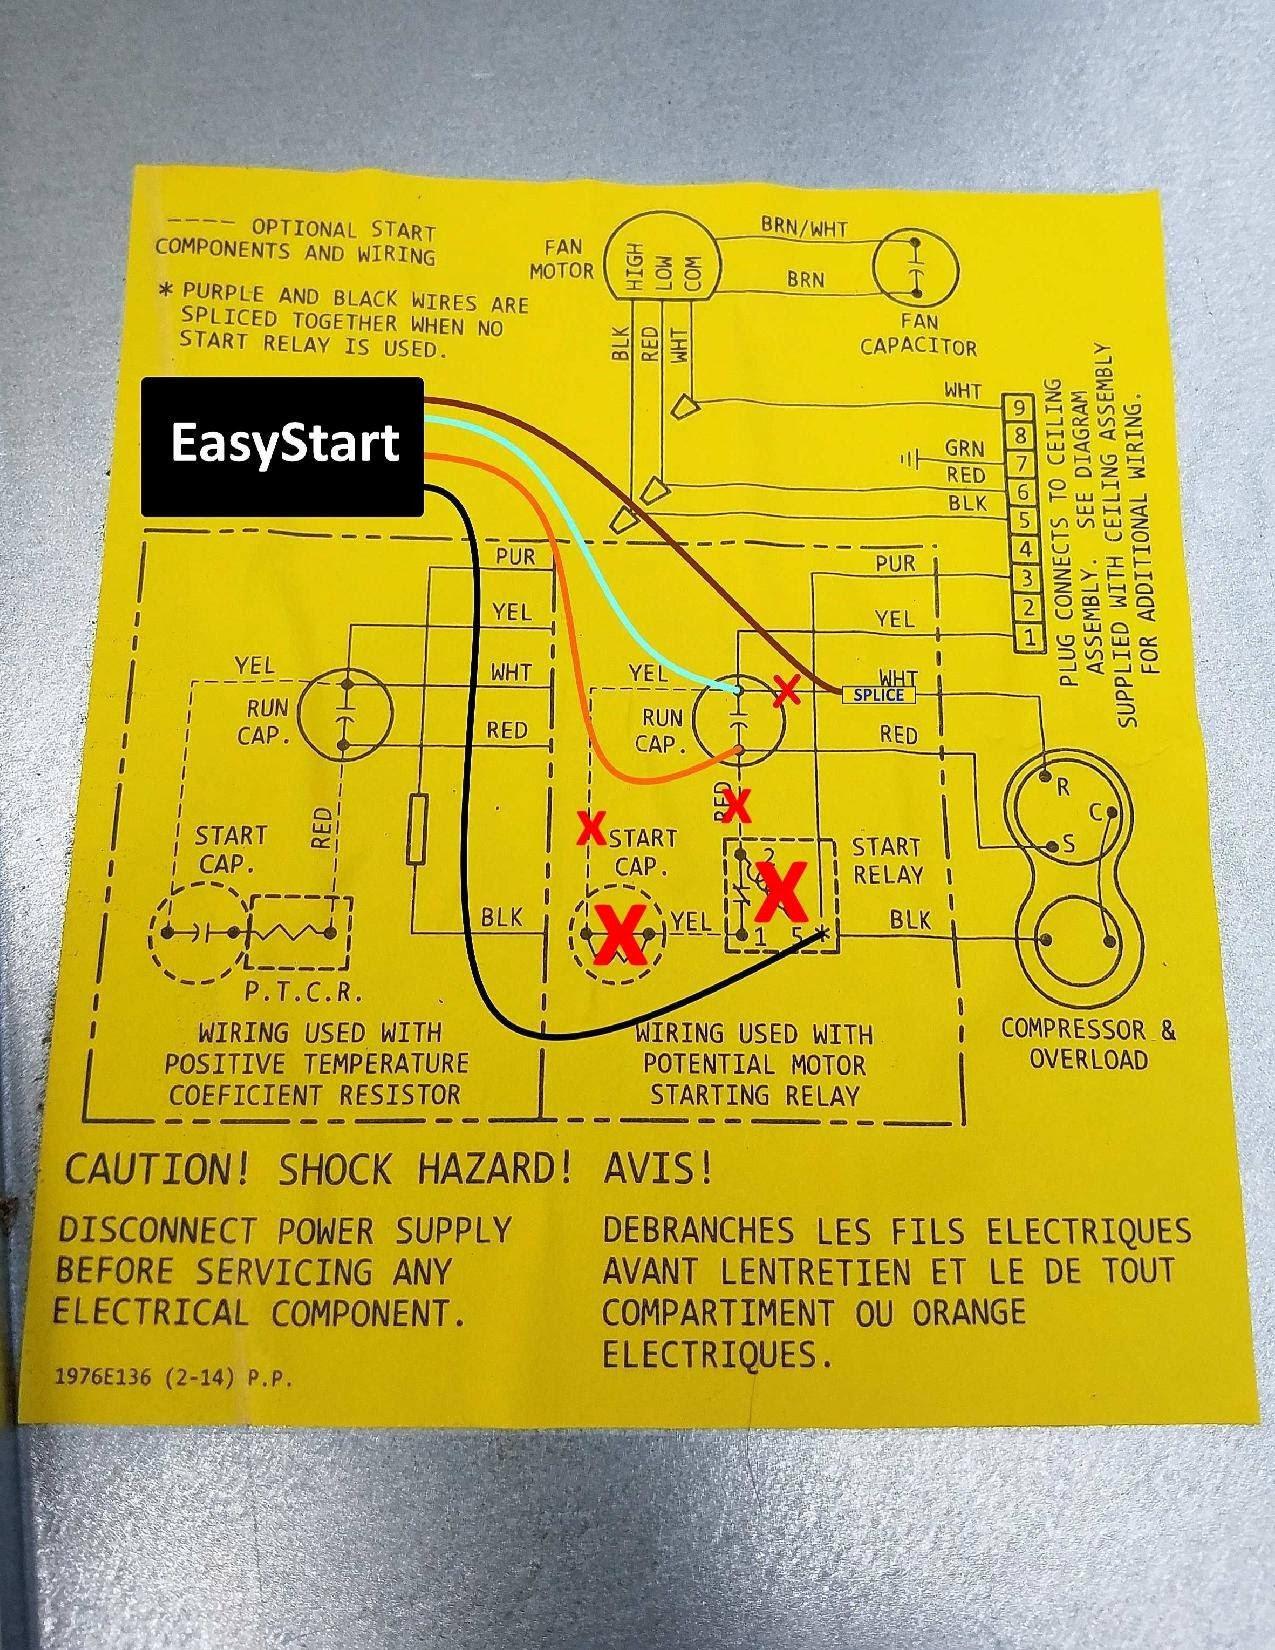 34 Coleman Rv Air Conditioner Wiring Diagram - Wiring ...